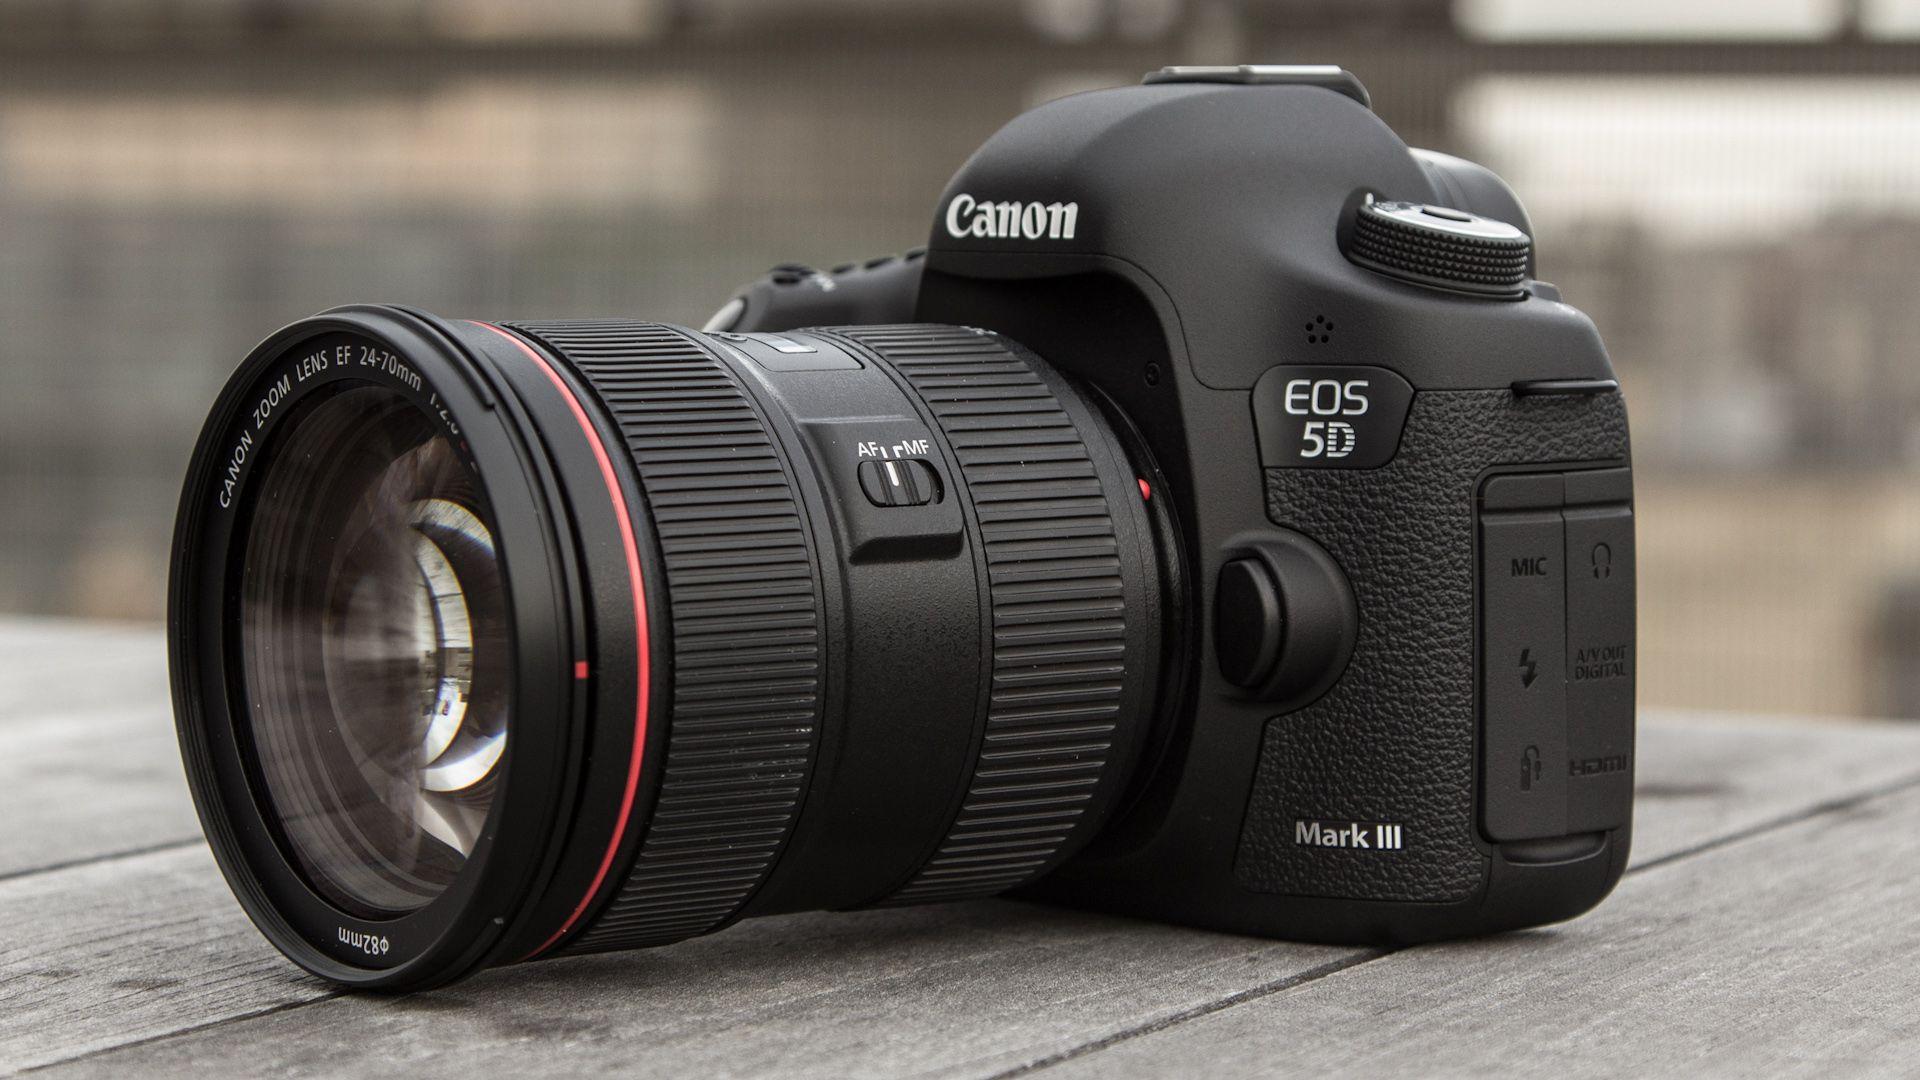 Canon Eos 5d Mark Iii Expensive Camera Best Dslr Dslr Video